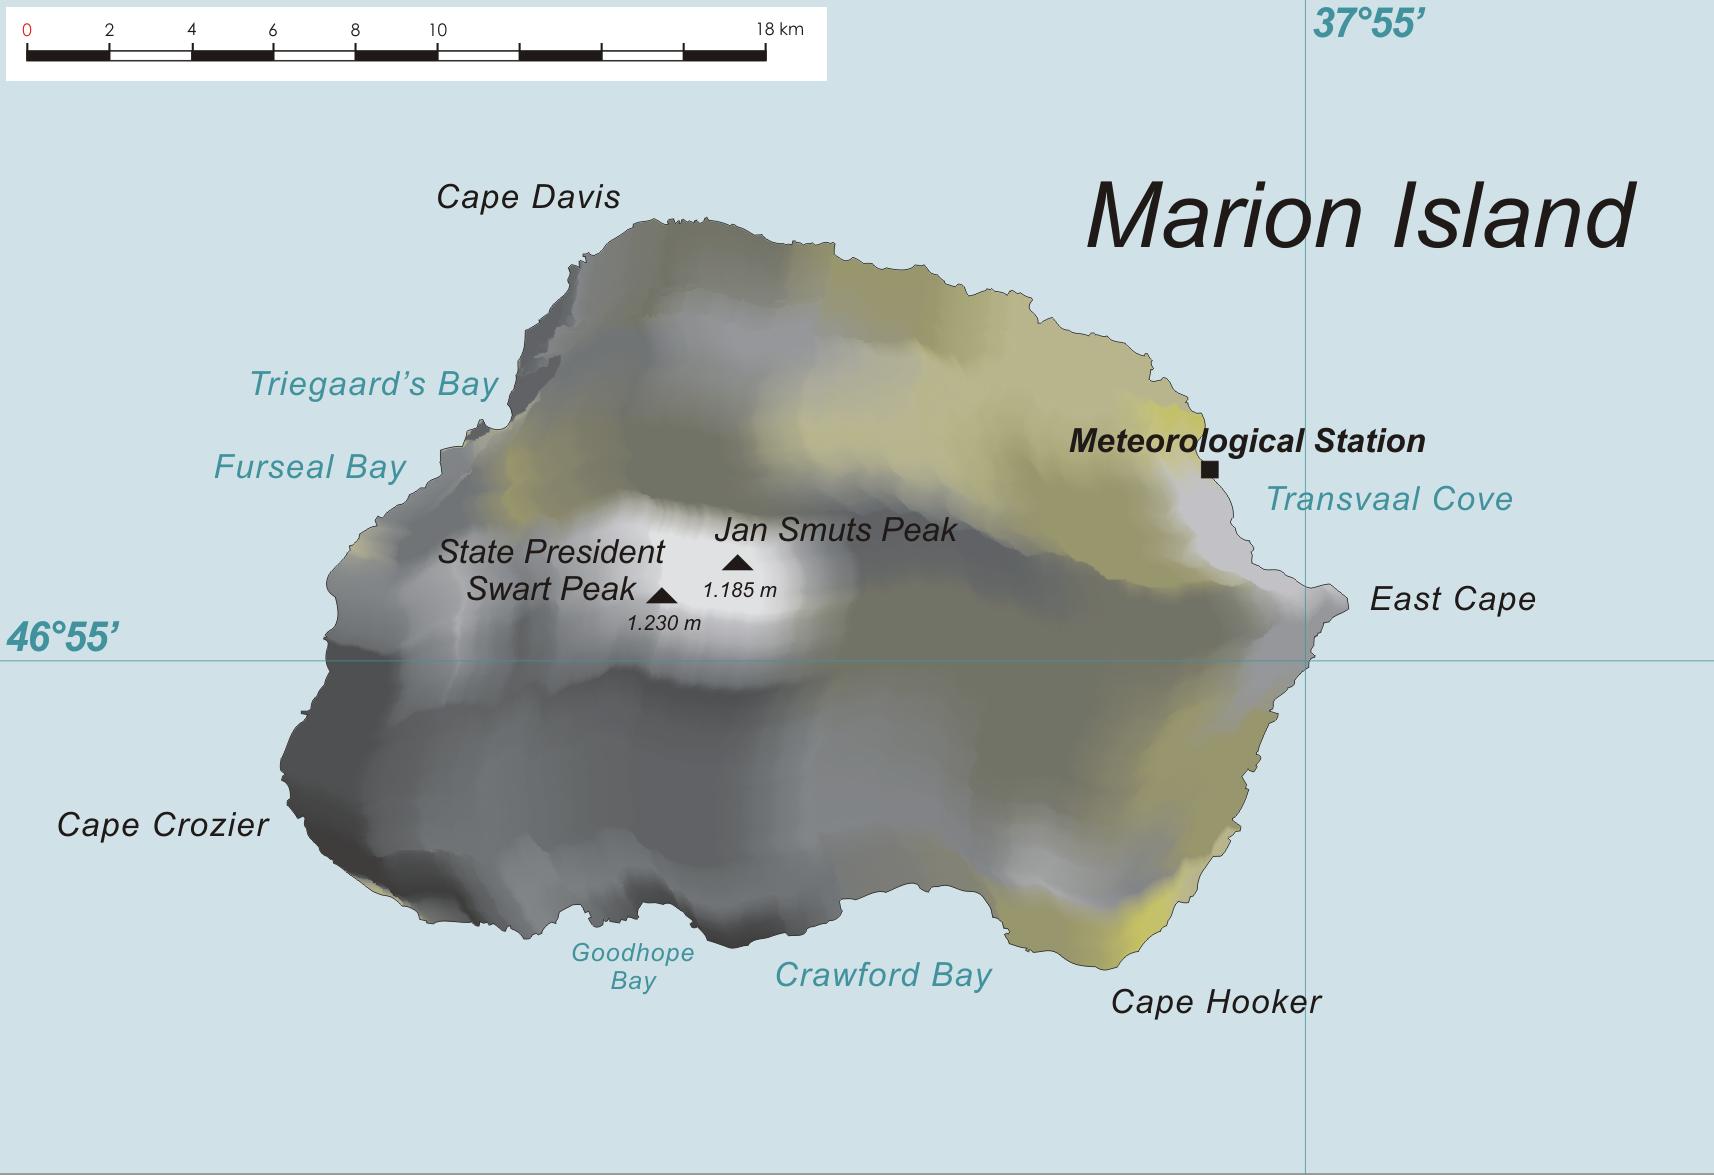 Marion Island (AF-021) DXpeditie